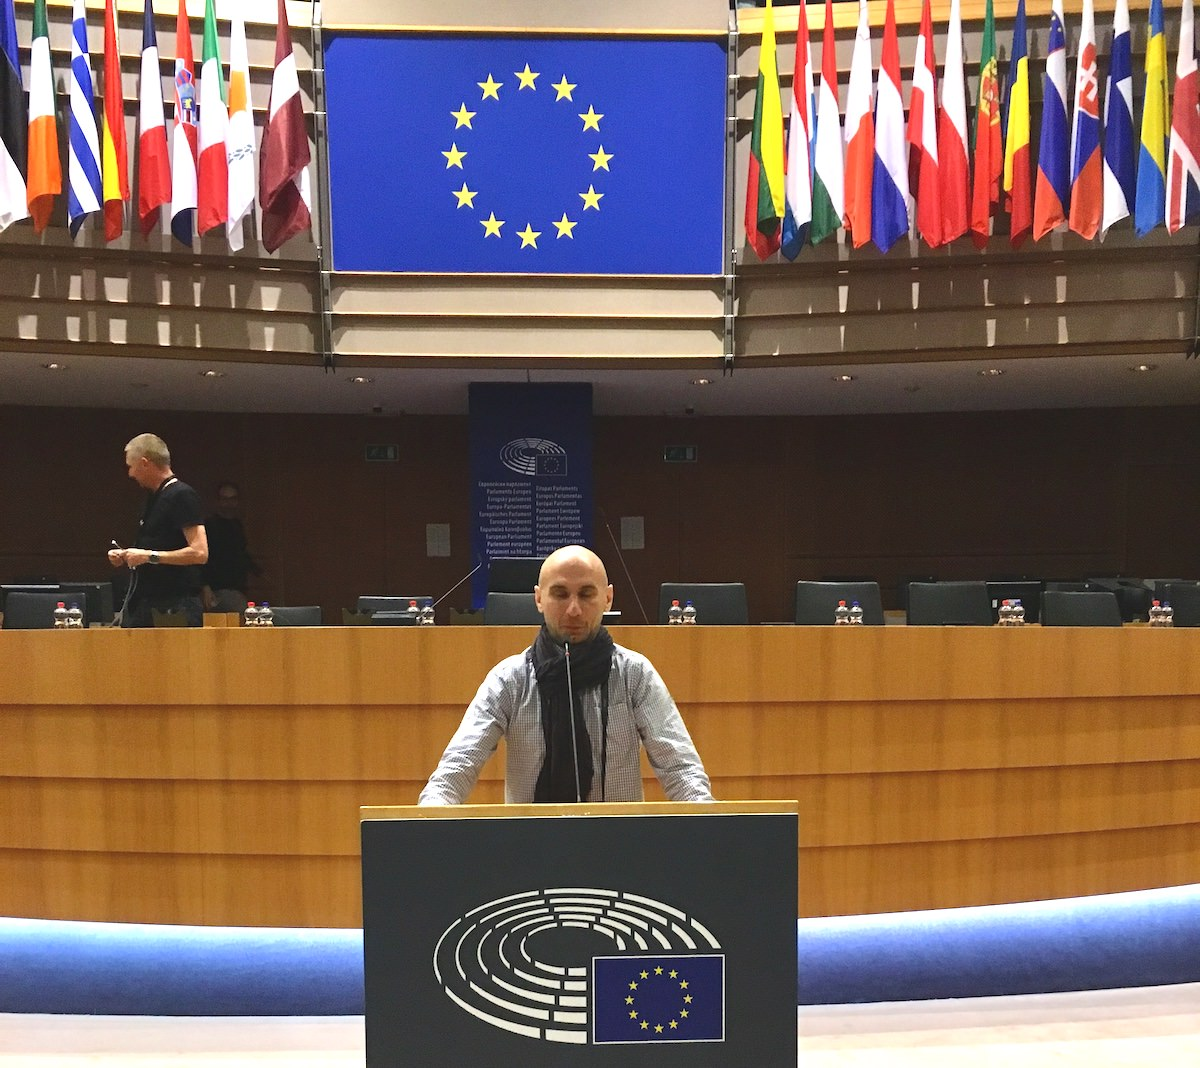 tokratgremvolit na EU volitve Evropske volitve 26. maj 2019